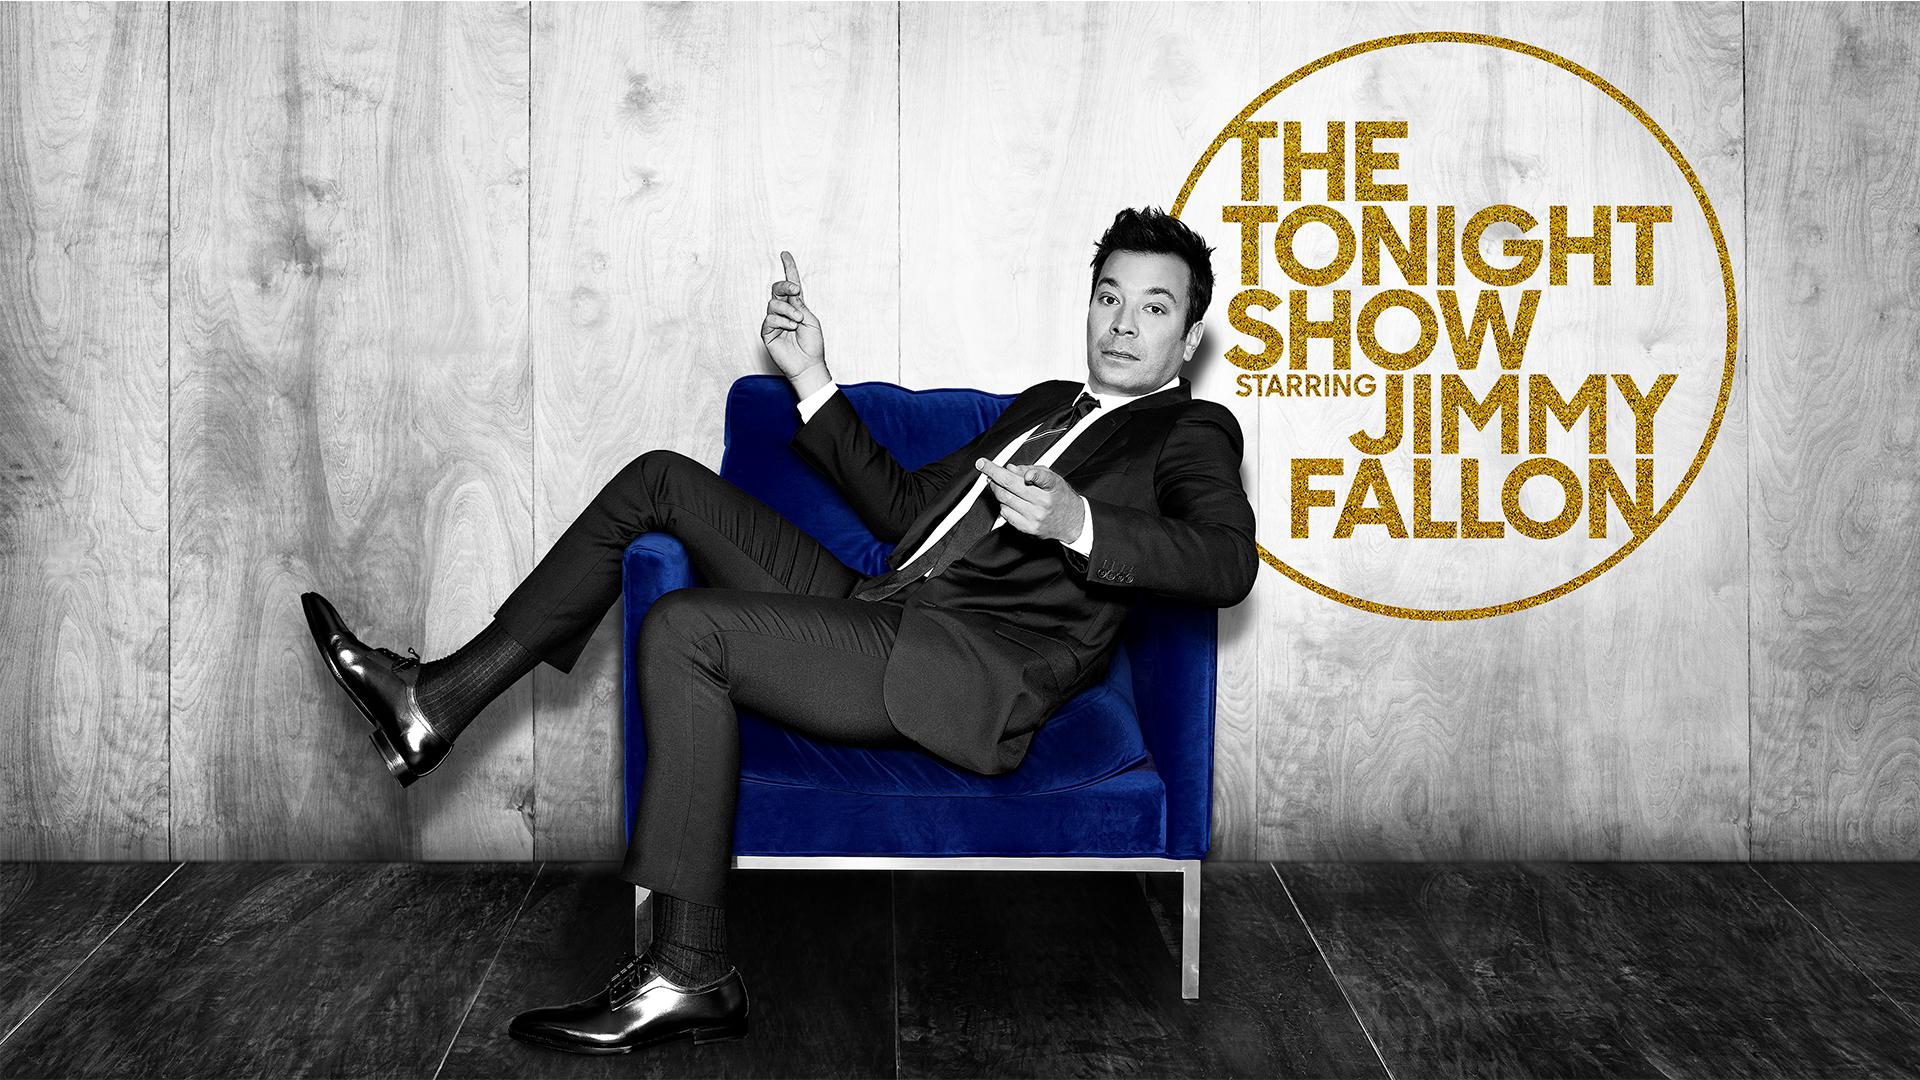 the tonight show starring jimmy fallon Watch The Tonight Show Starring Jimmy Fallon Episodes at NBC.com